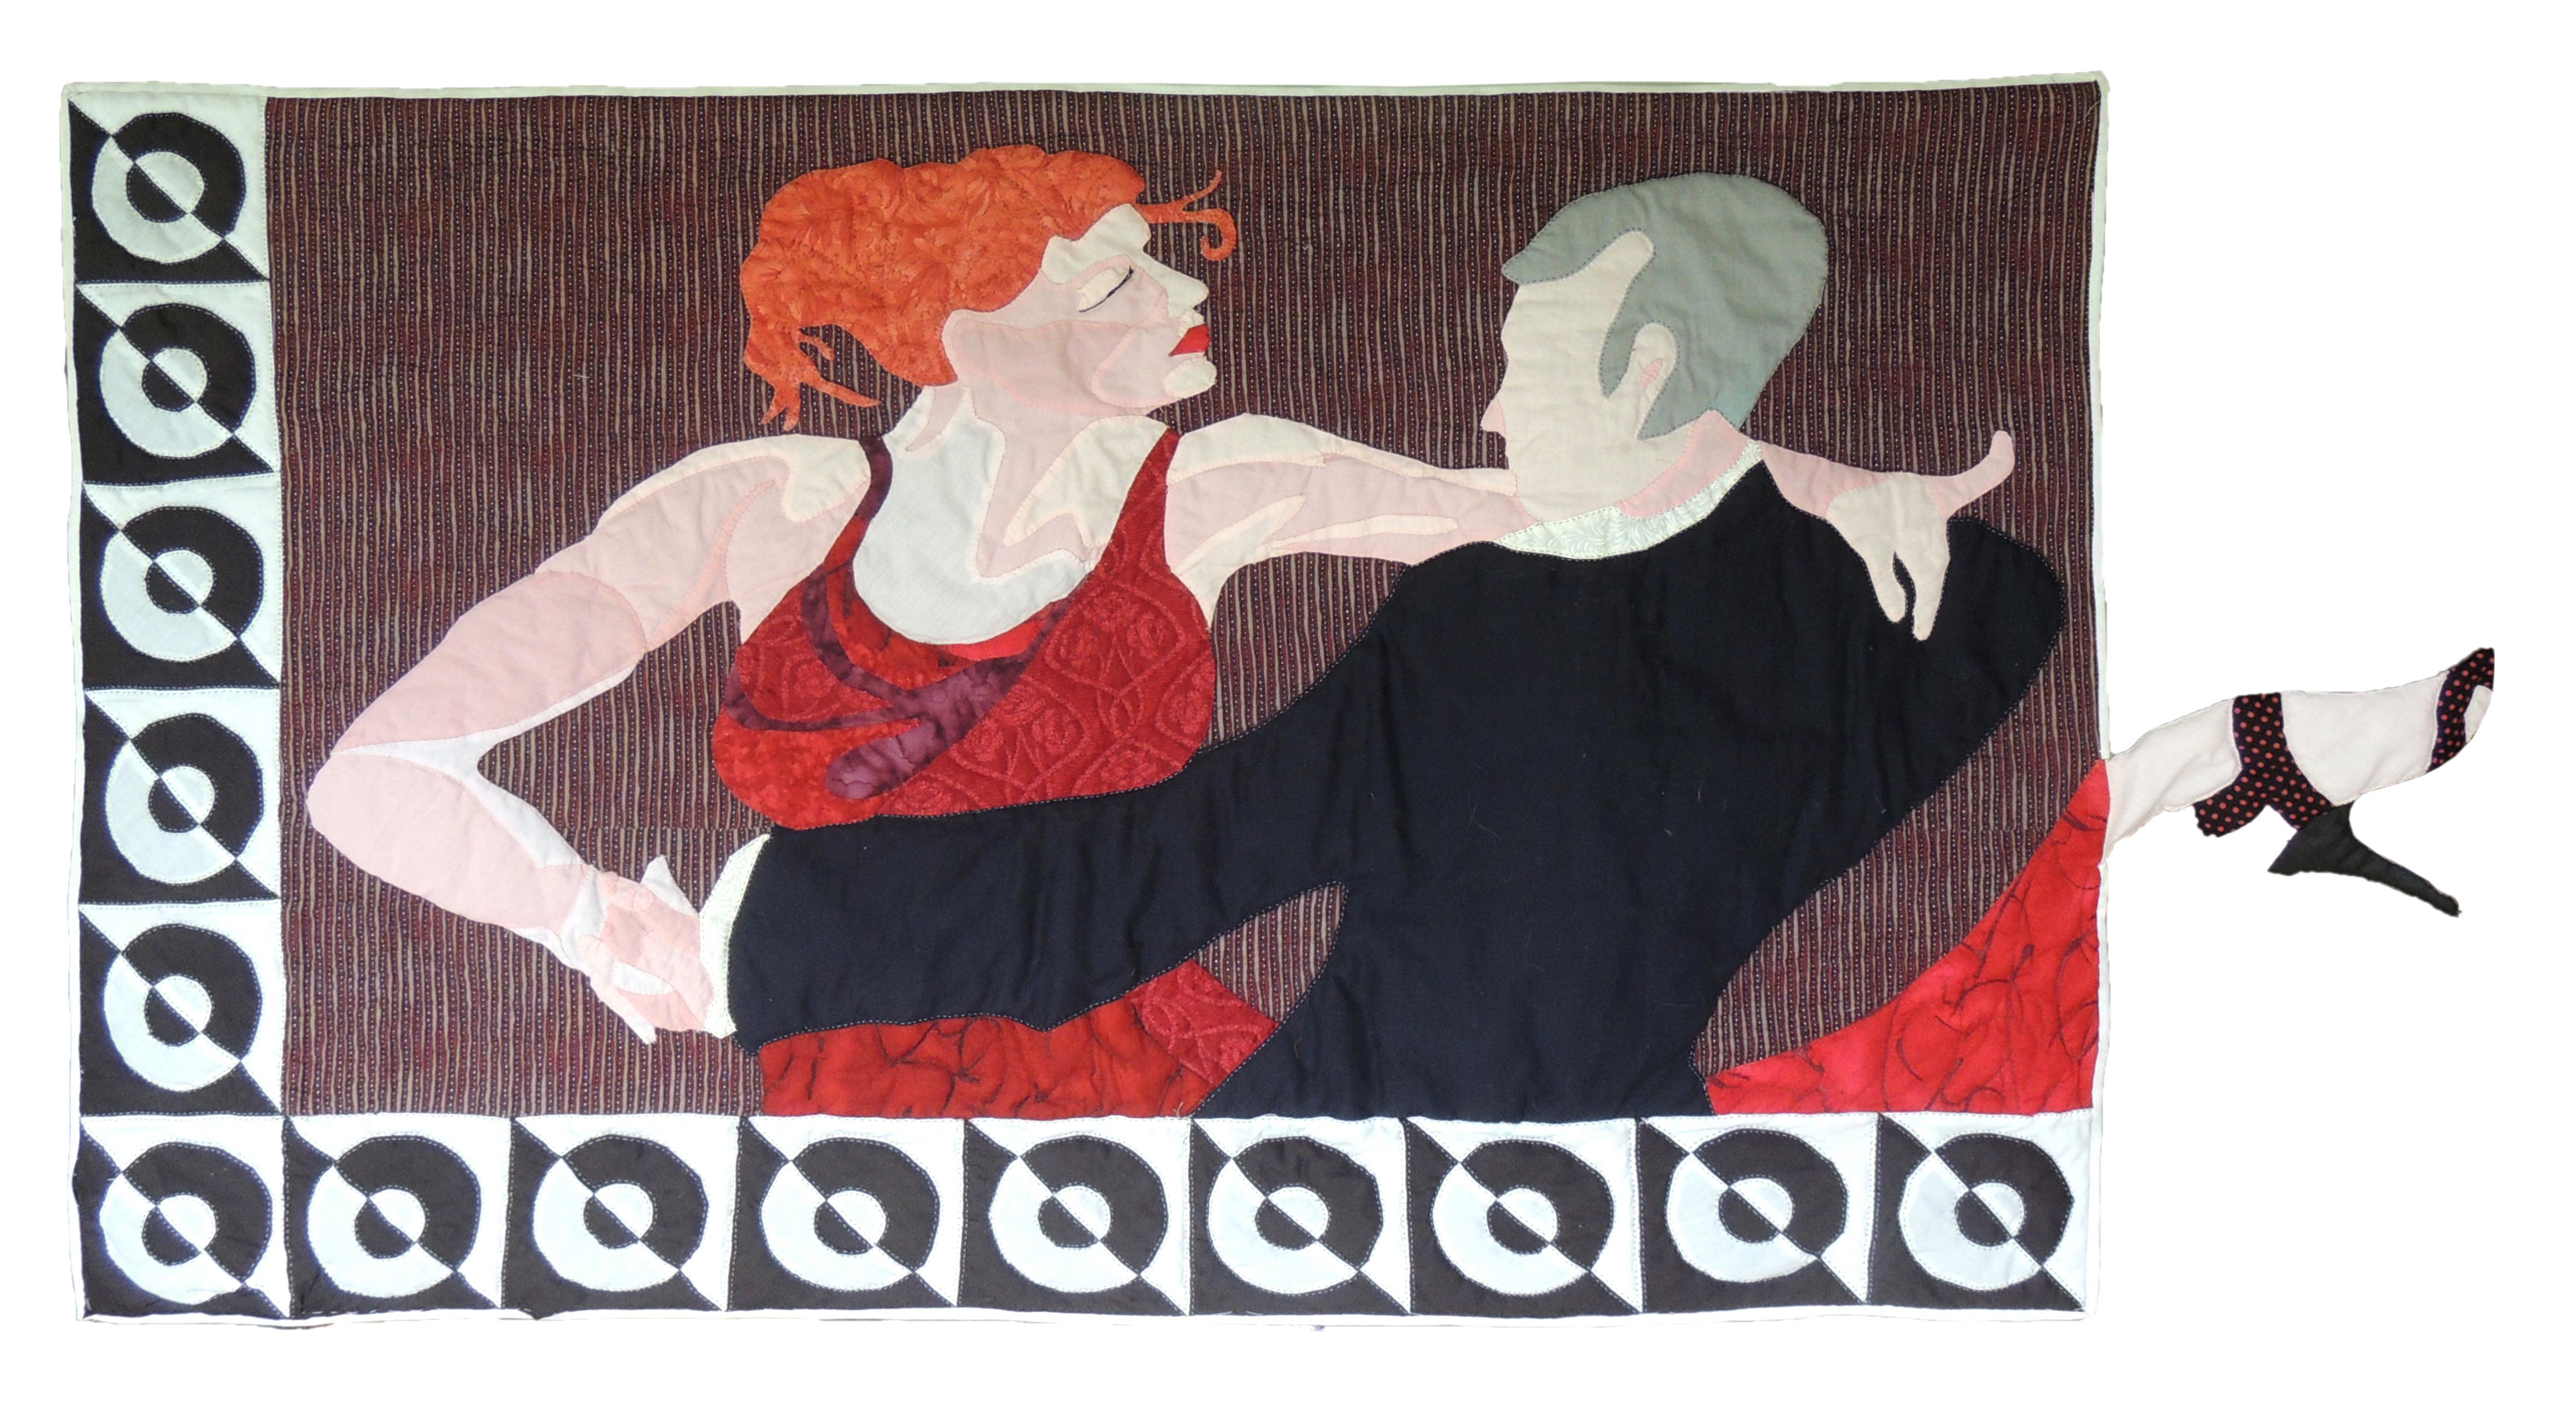 "Marianne Rabb Britton | DANCING FOOT | Fabric & Embroidery | 29 x 54""| Estate of Marianne Rabb Britton"